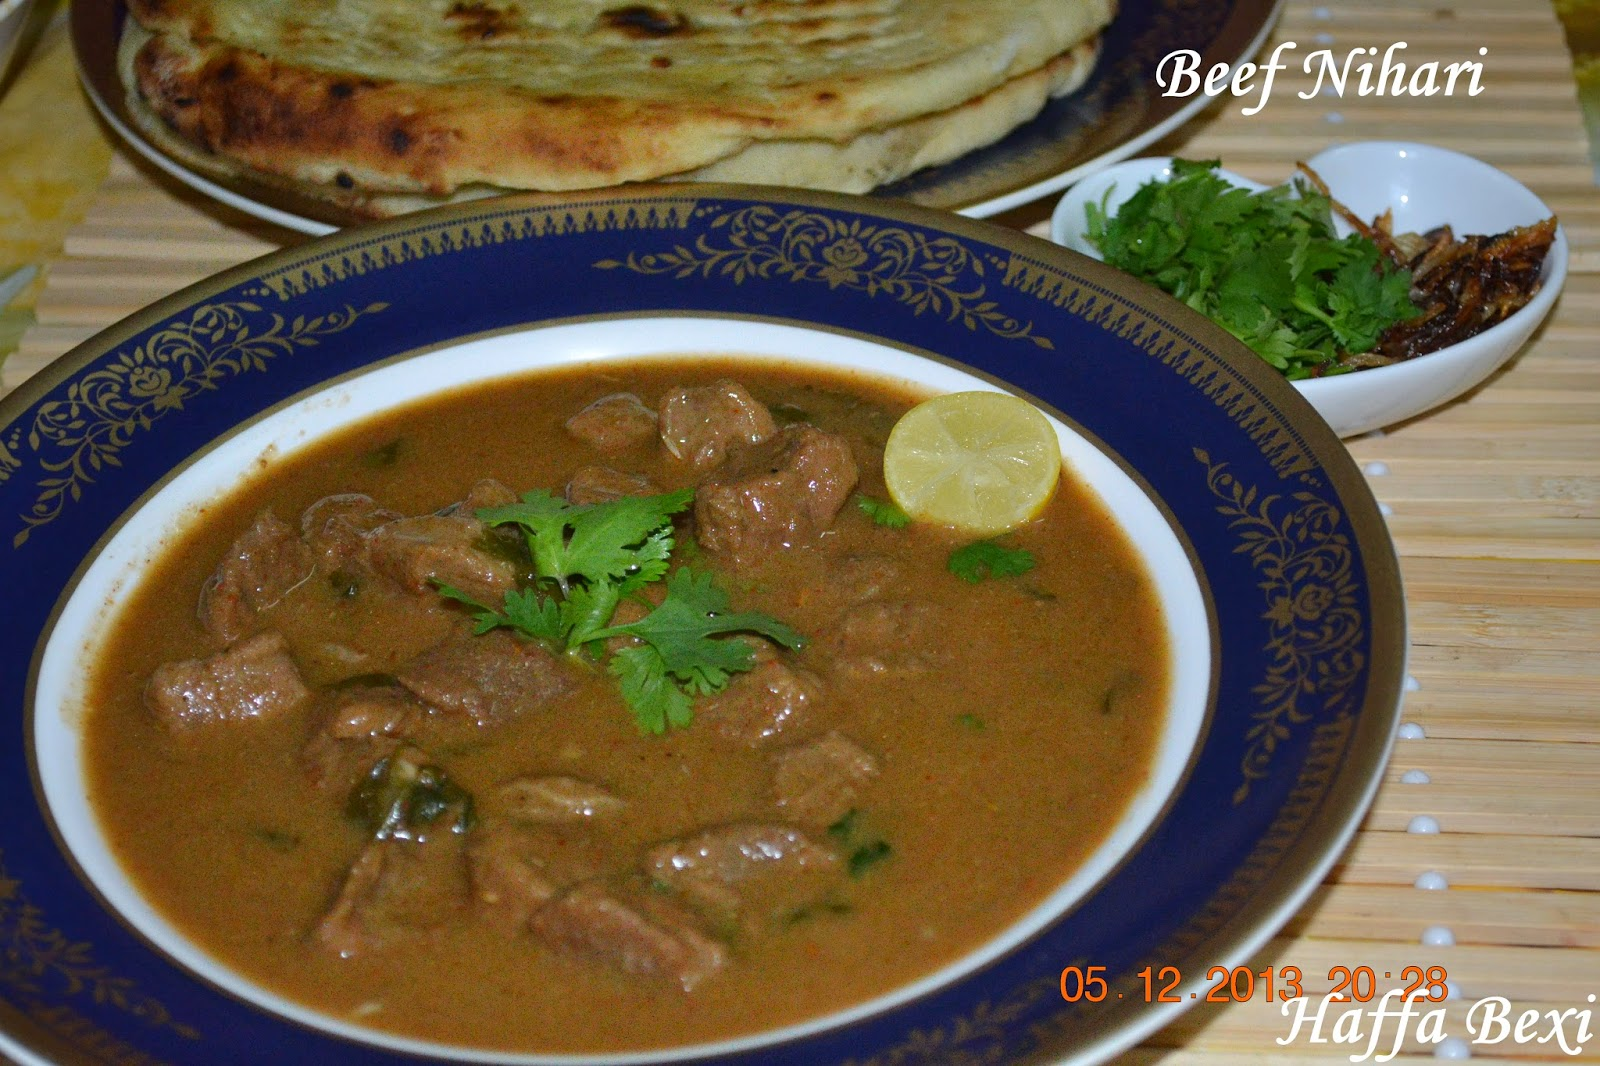 beef stew| beef stroganoff| beef stew recipe| nihari recipe| nihari ...